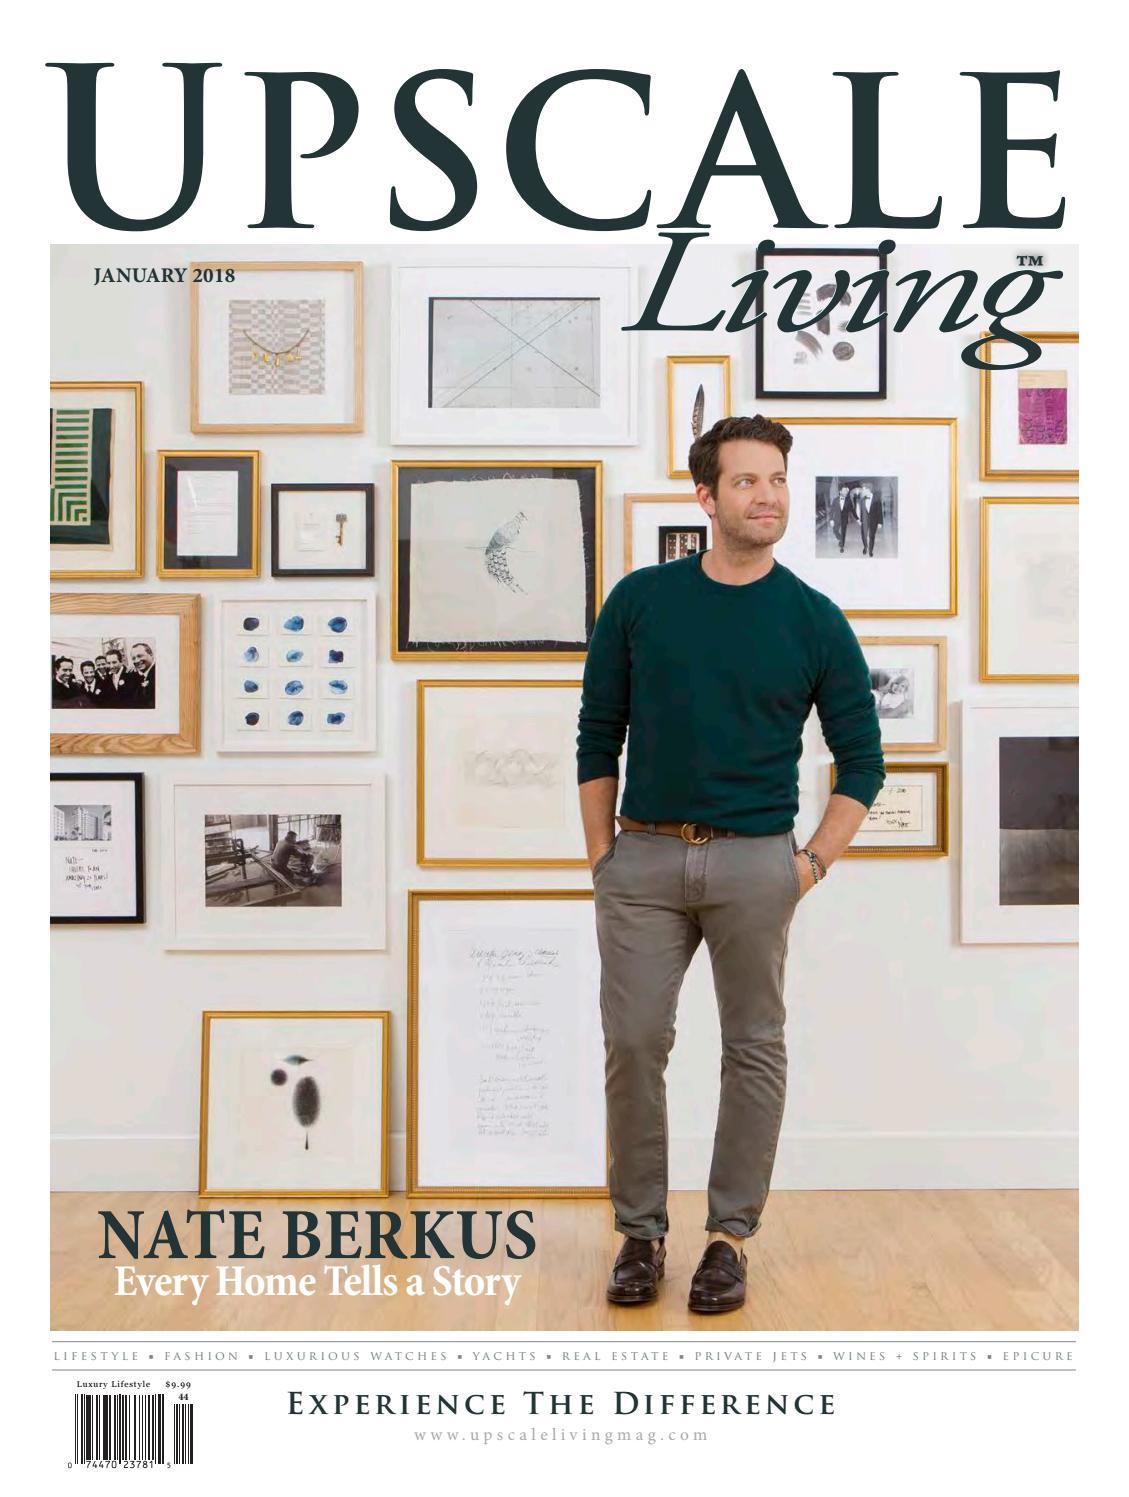 Jan 2018 digital magazine by Upscale Living Magazine - issuu 250ffc6eb659